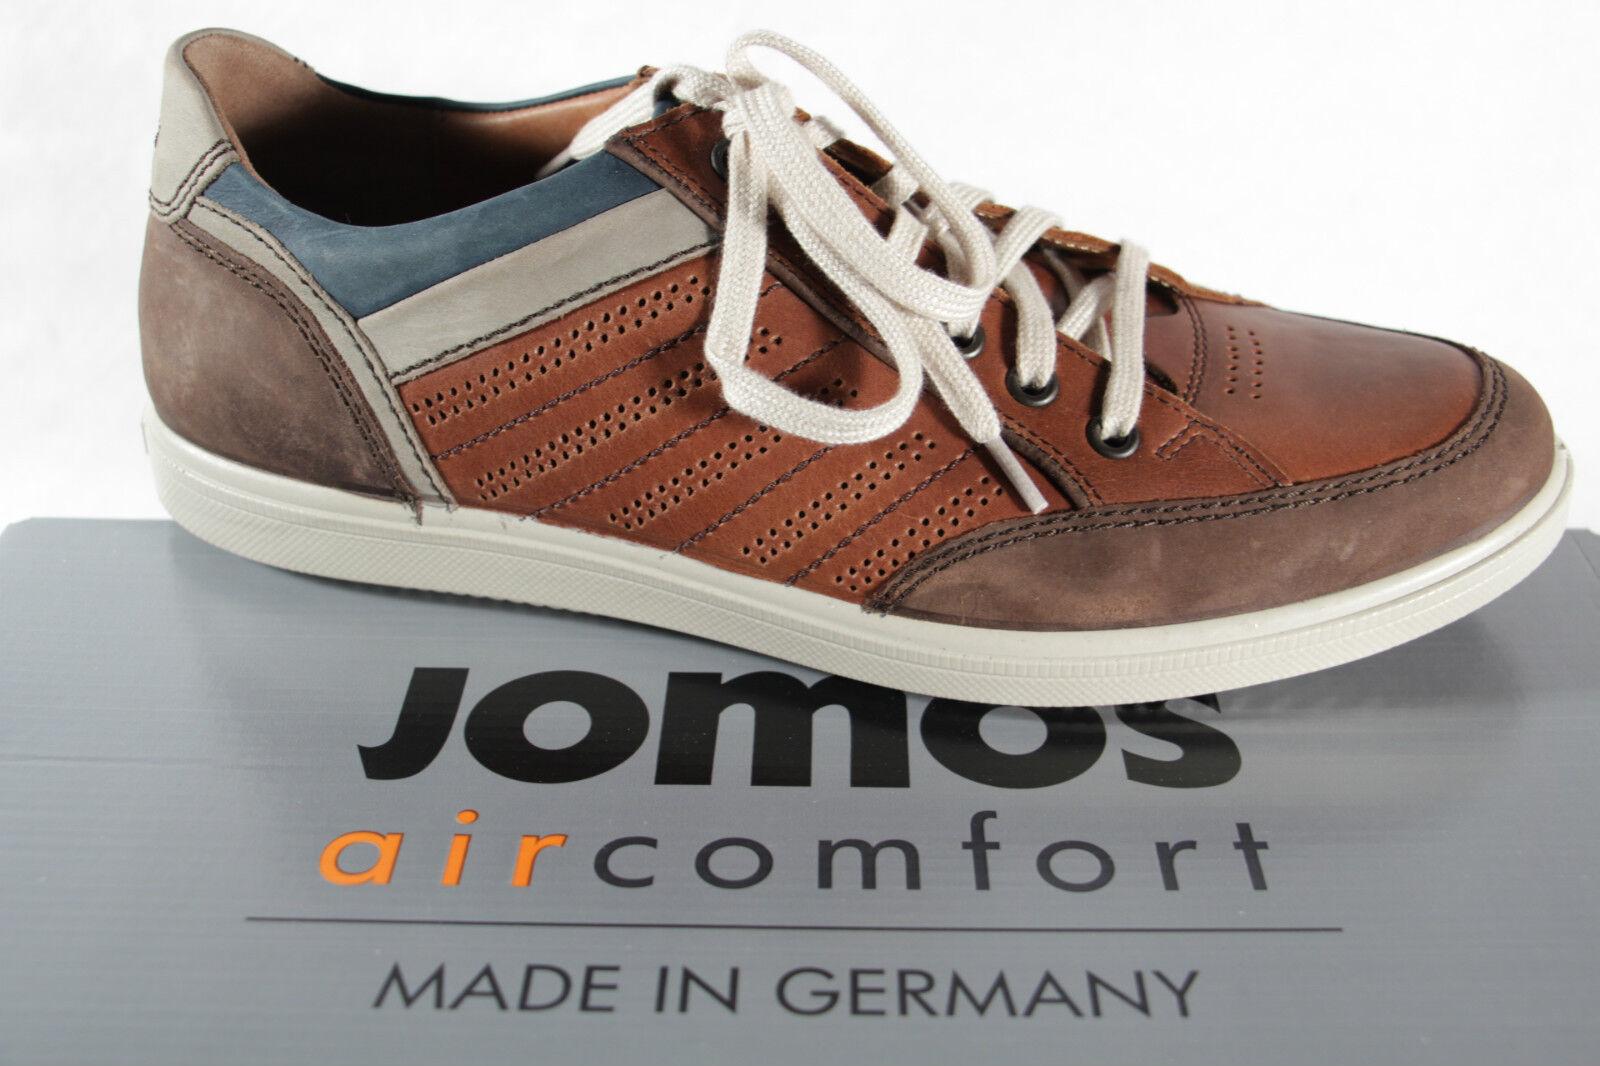 Jomos aircomfort Herren Schnürschuh 316216  Sneakers Halbschuh braun Leder  316216 NEU da6249